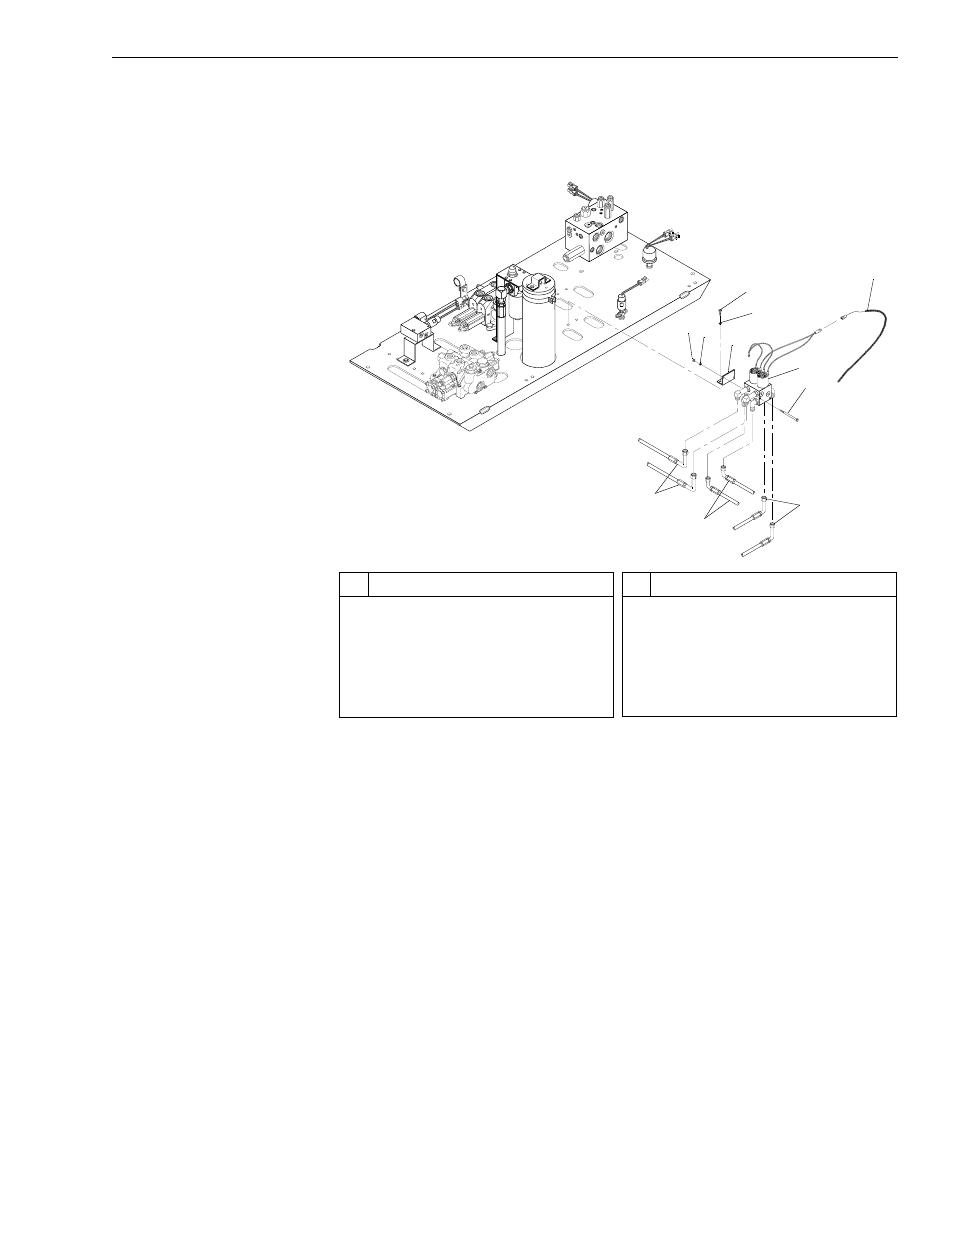 844c Jlg Wiring Schematic - construction equipment parts jlg ... Viking Wiring Diagram on